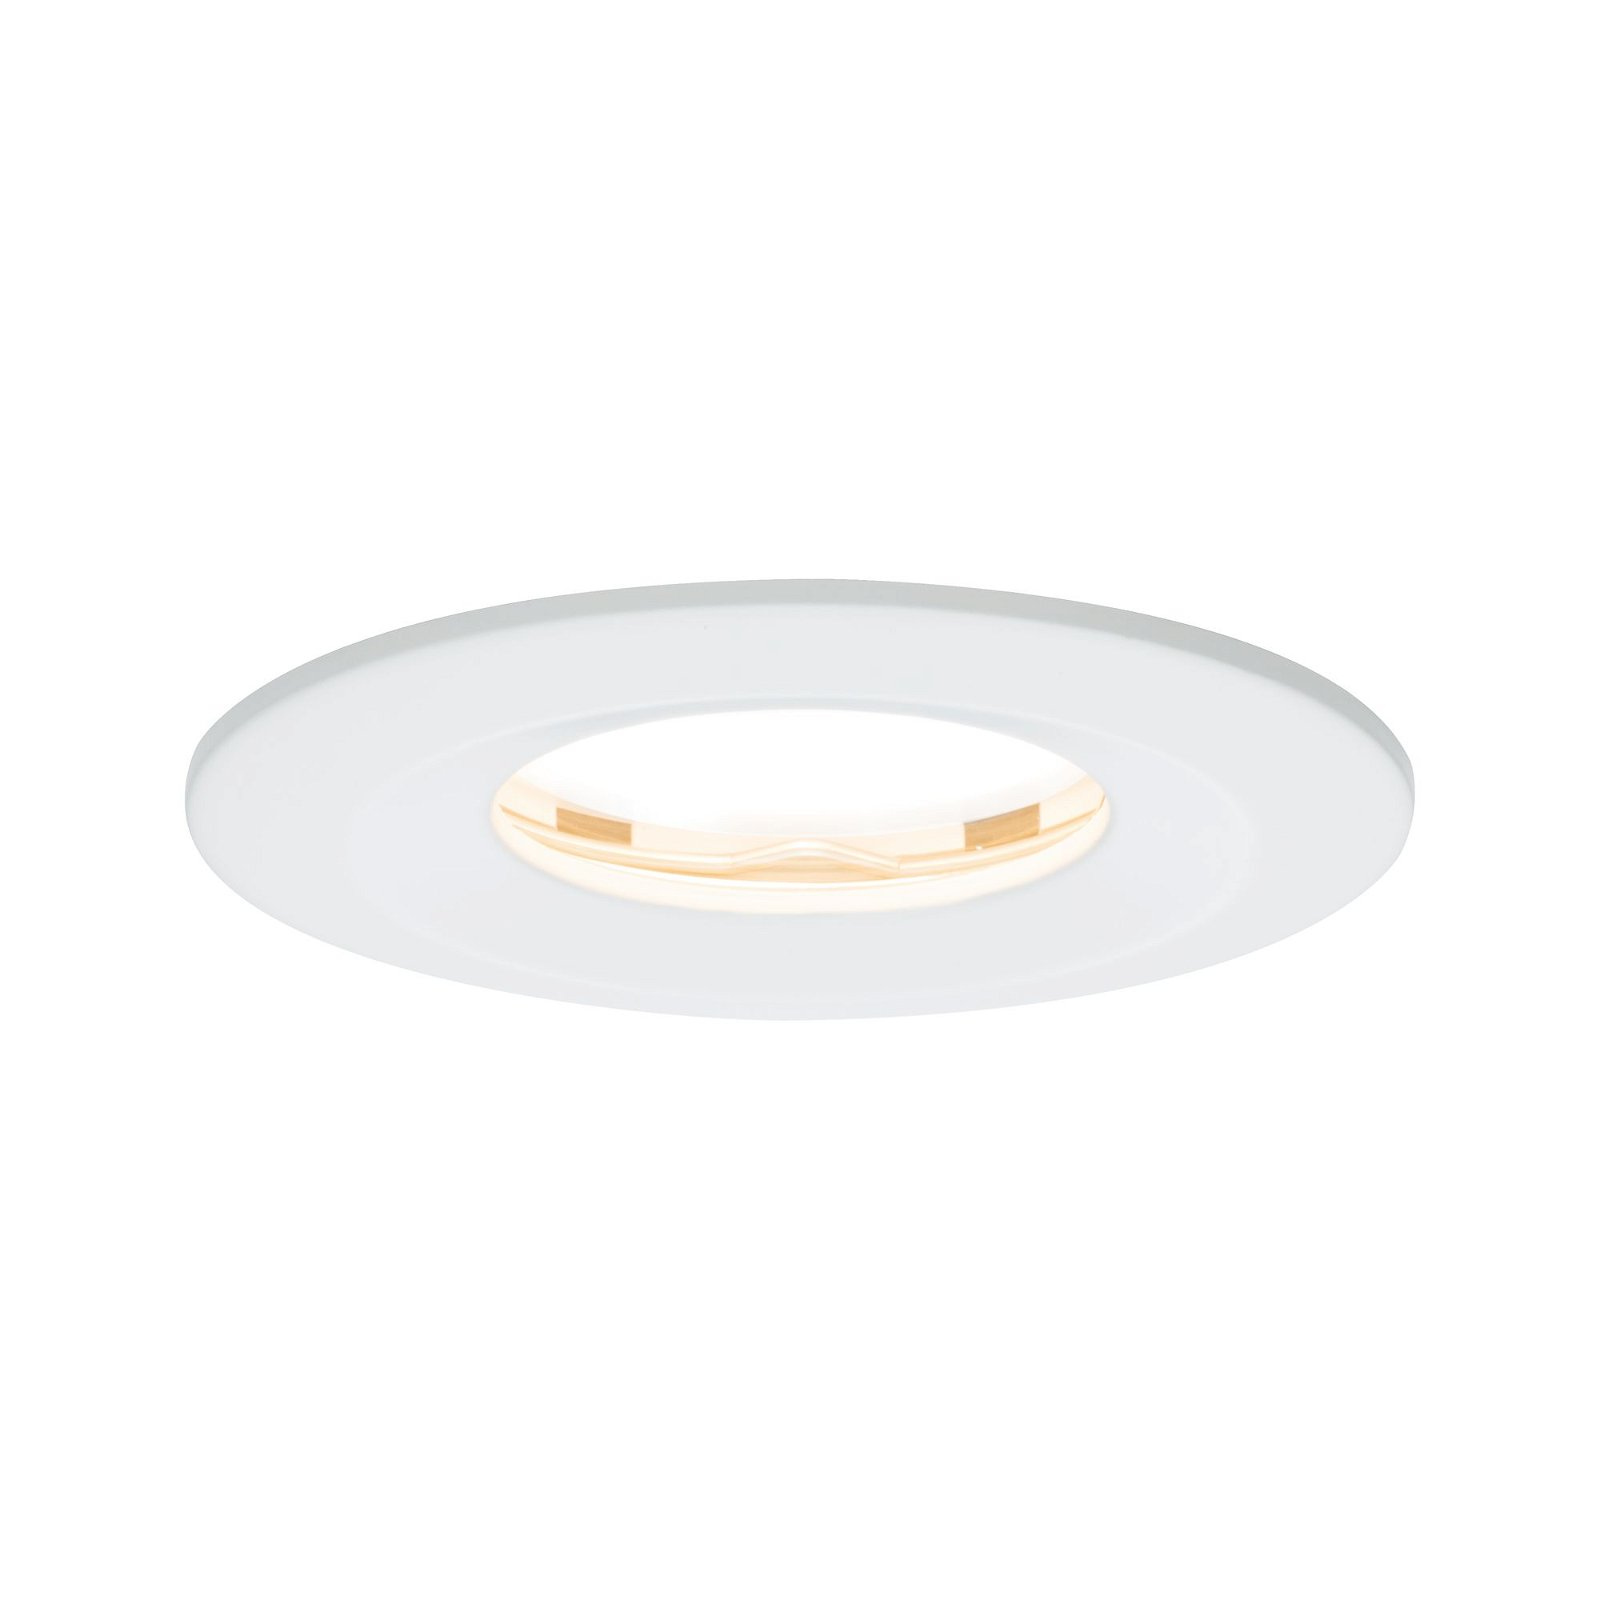 Spot encastré LED Nova Plus fixe IP65 rond 78mm Coin 6,8W 425lm 230V 2700K Blanc dépoli